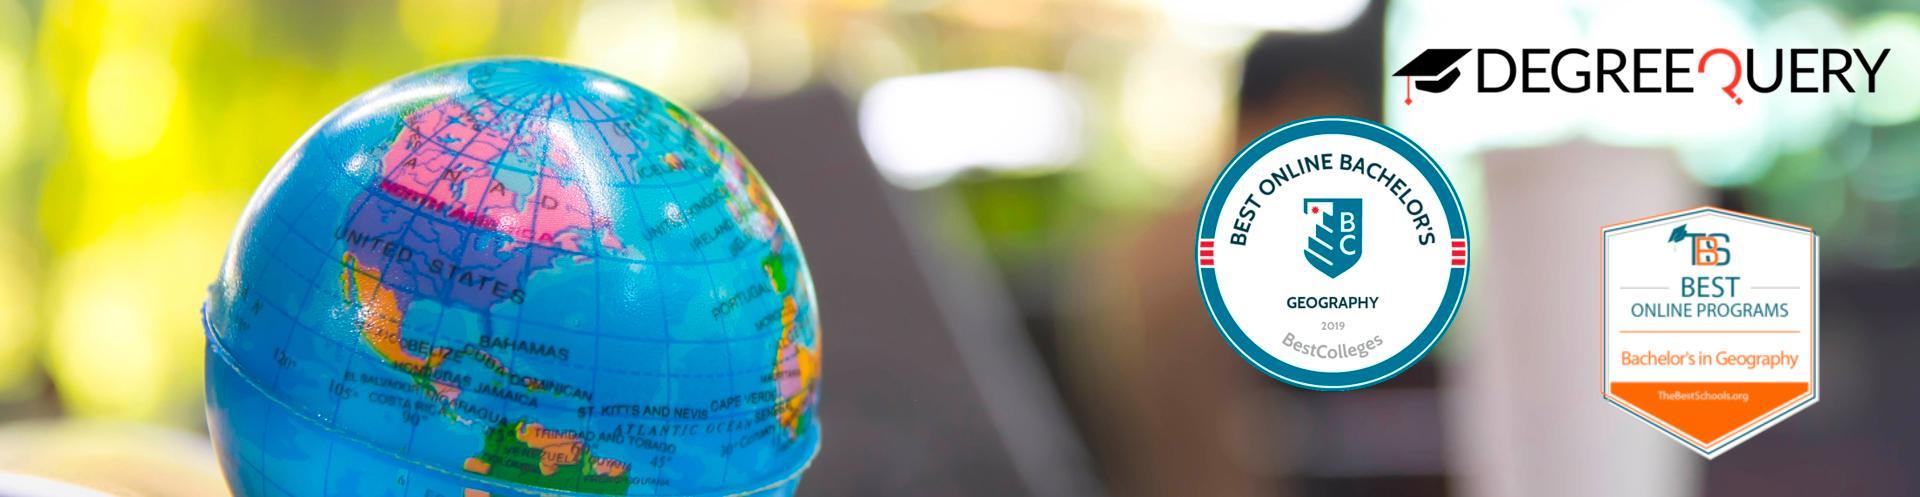 KSU's Online Geography degree ranked best in U.S